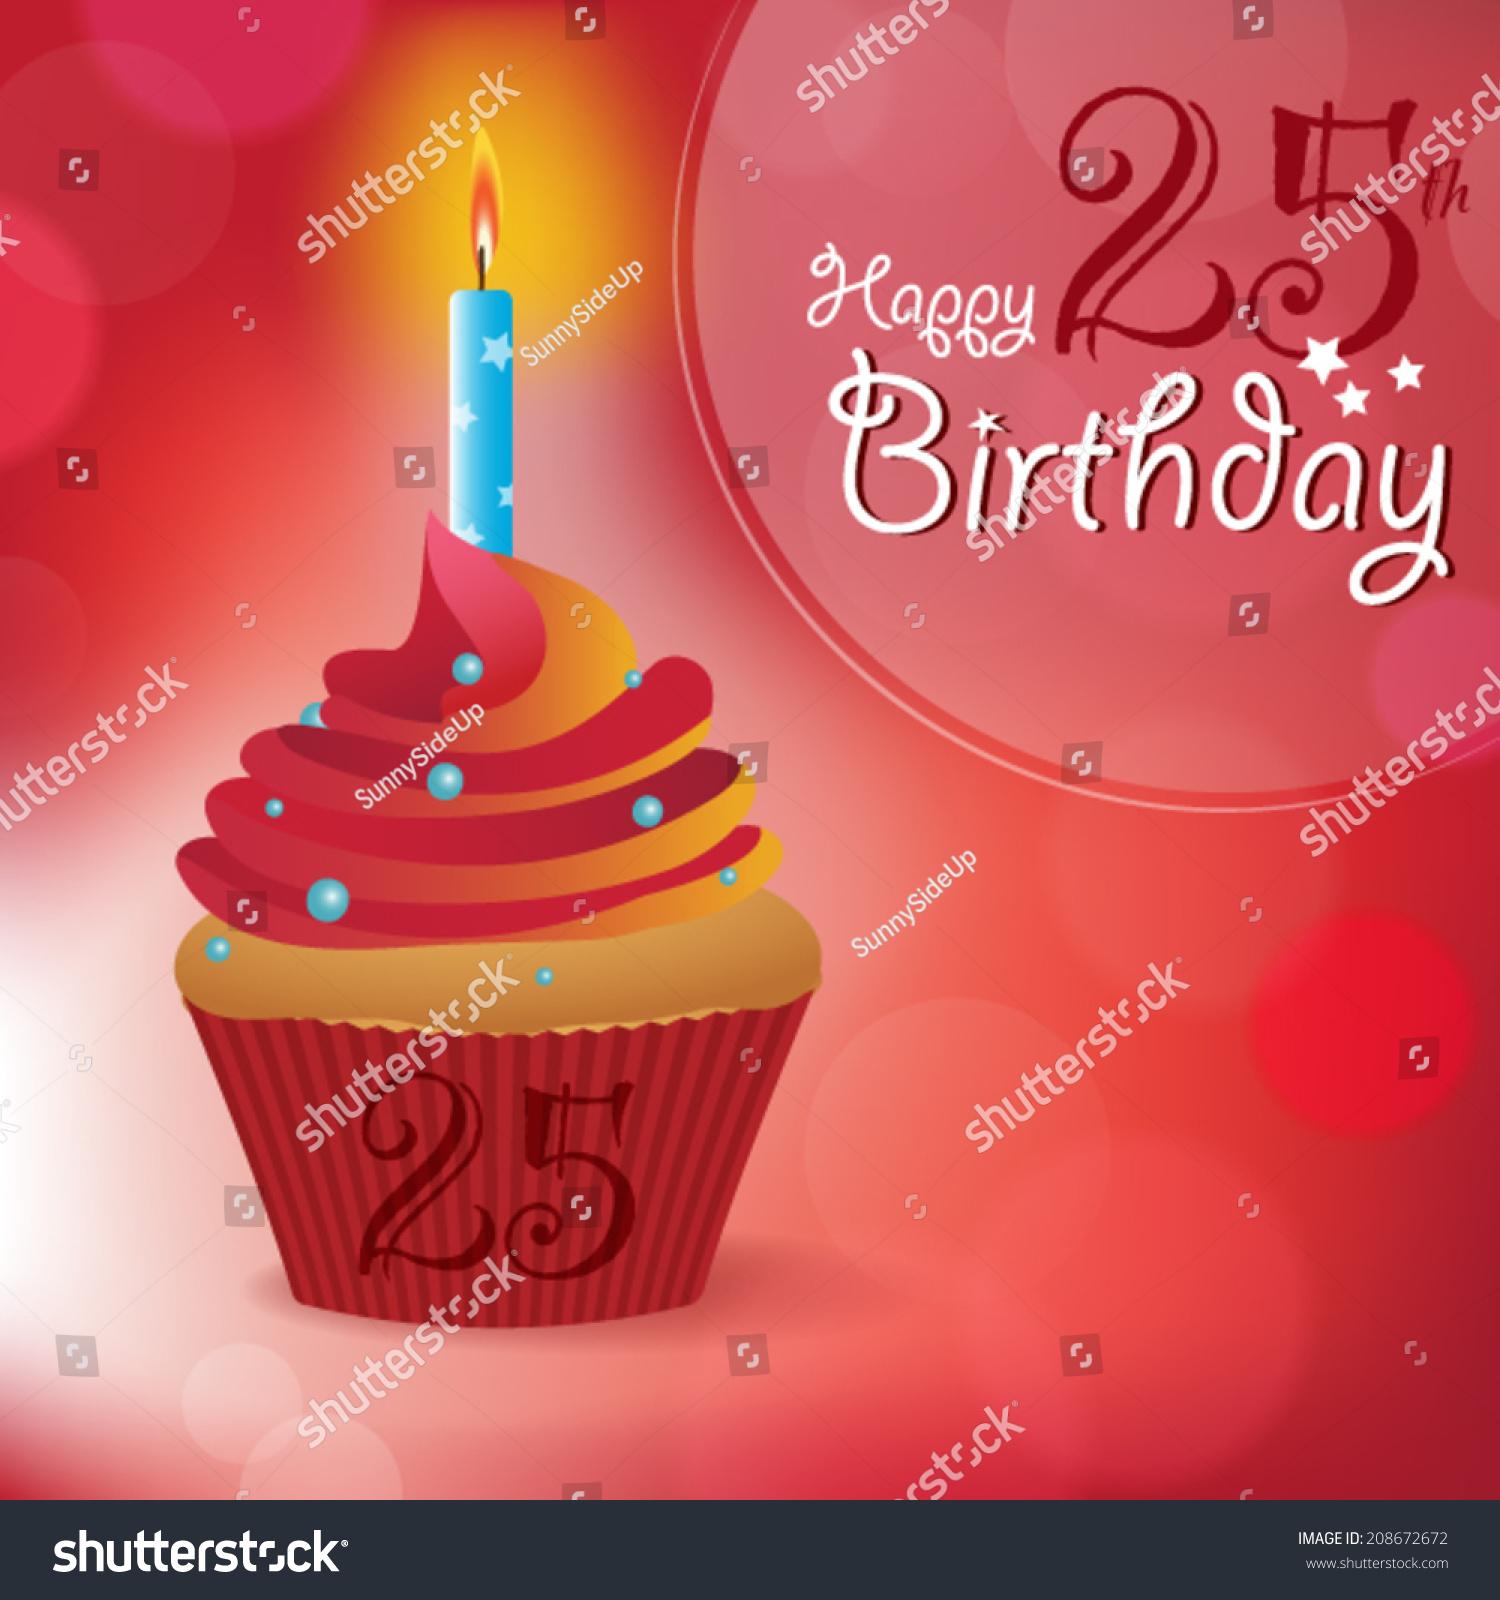 Happy 25th Birthday Greeting Invitation Message Stock Vector